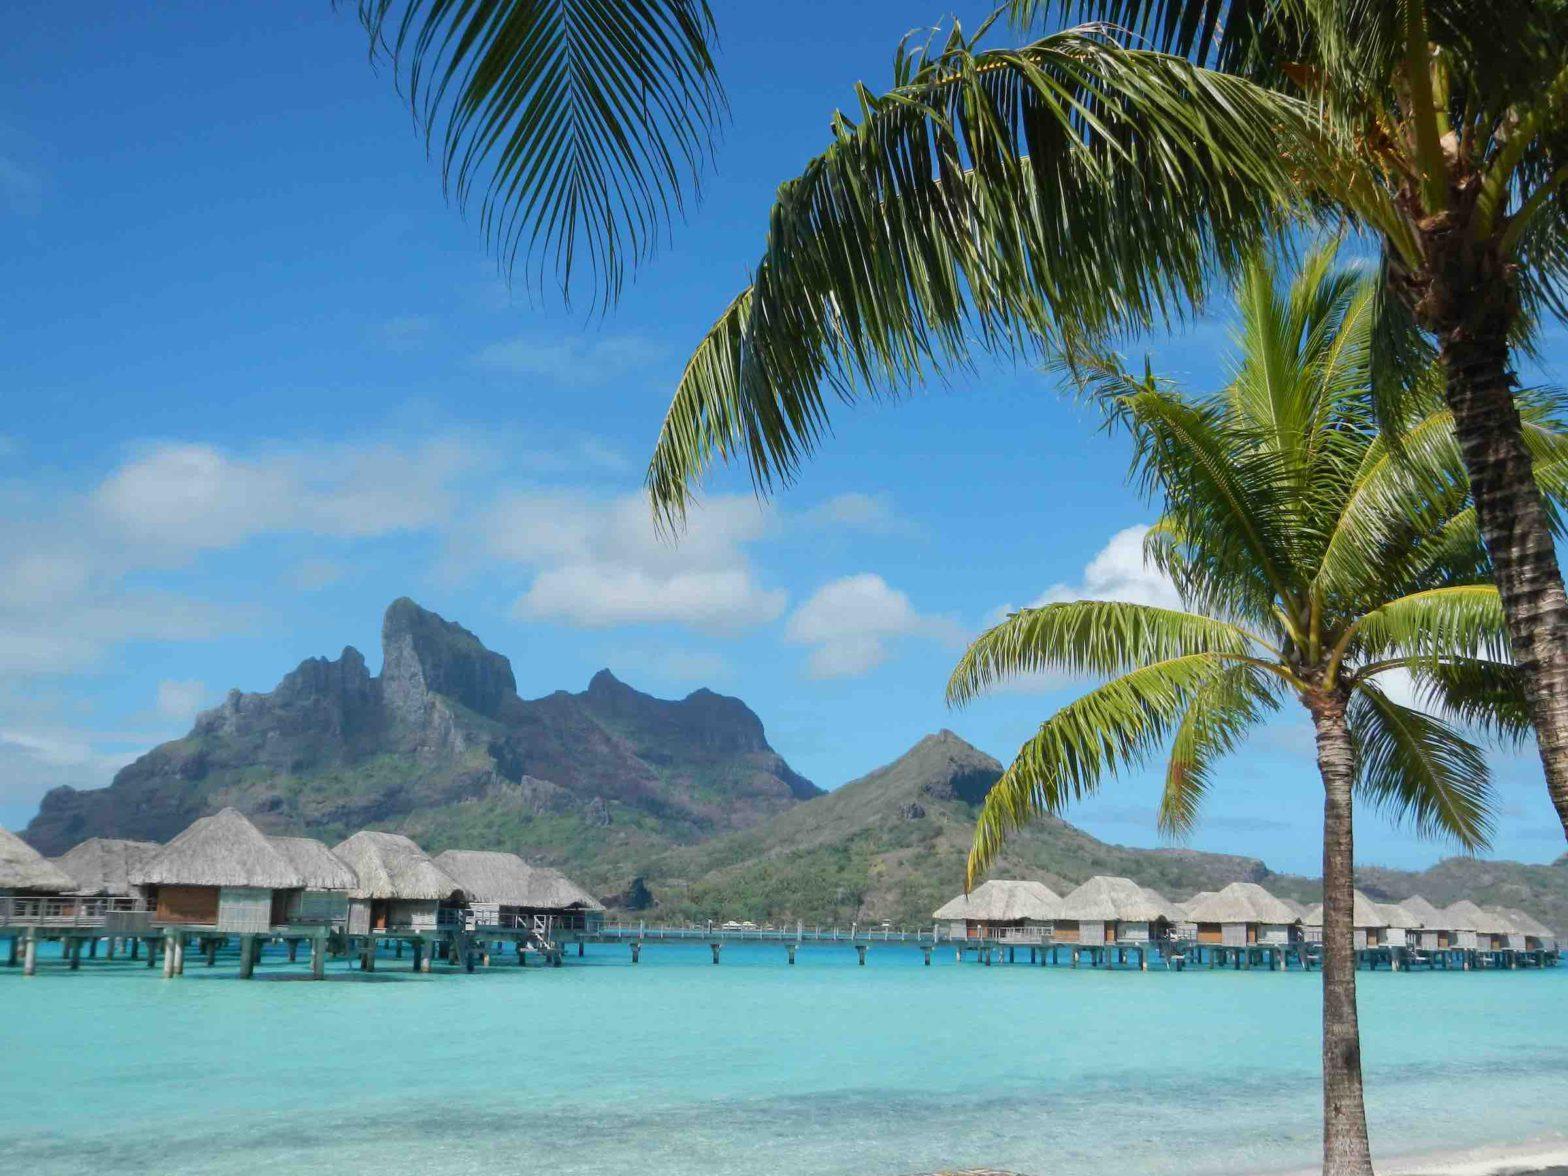 Overwater Bungalows in Bora Bora, Tahiti